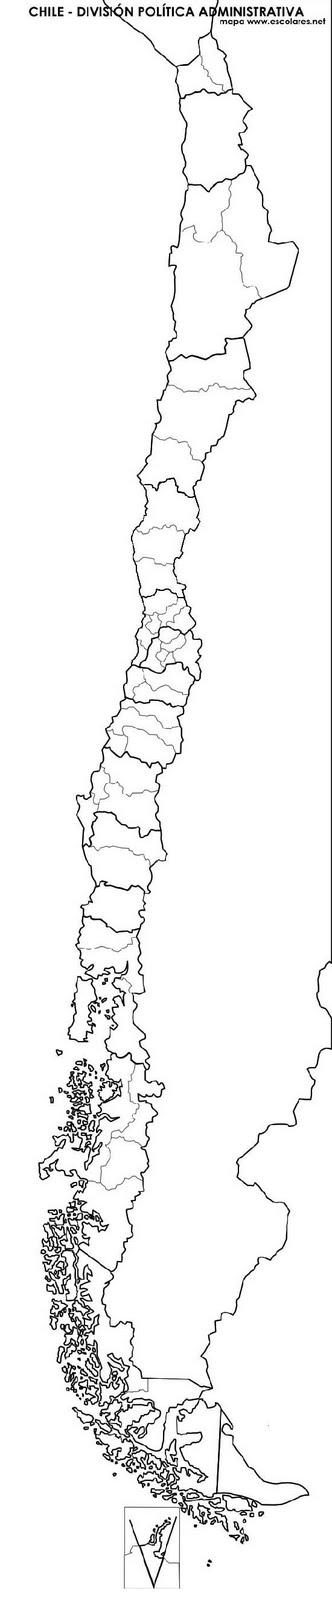 Mapa Mudo Politico De Chile Para Colorear